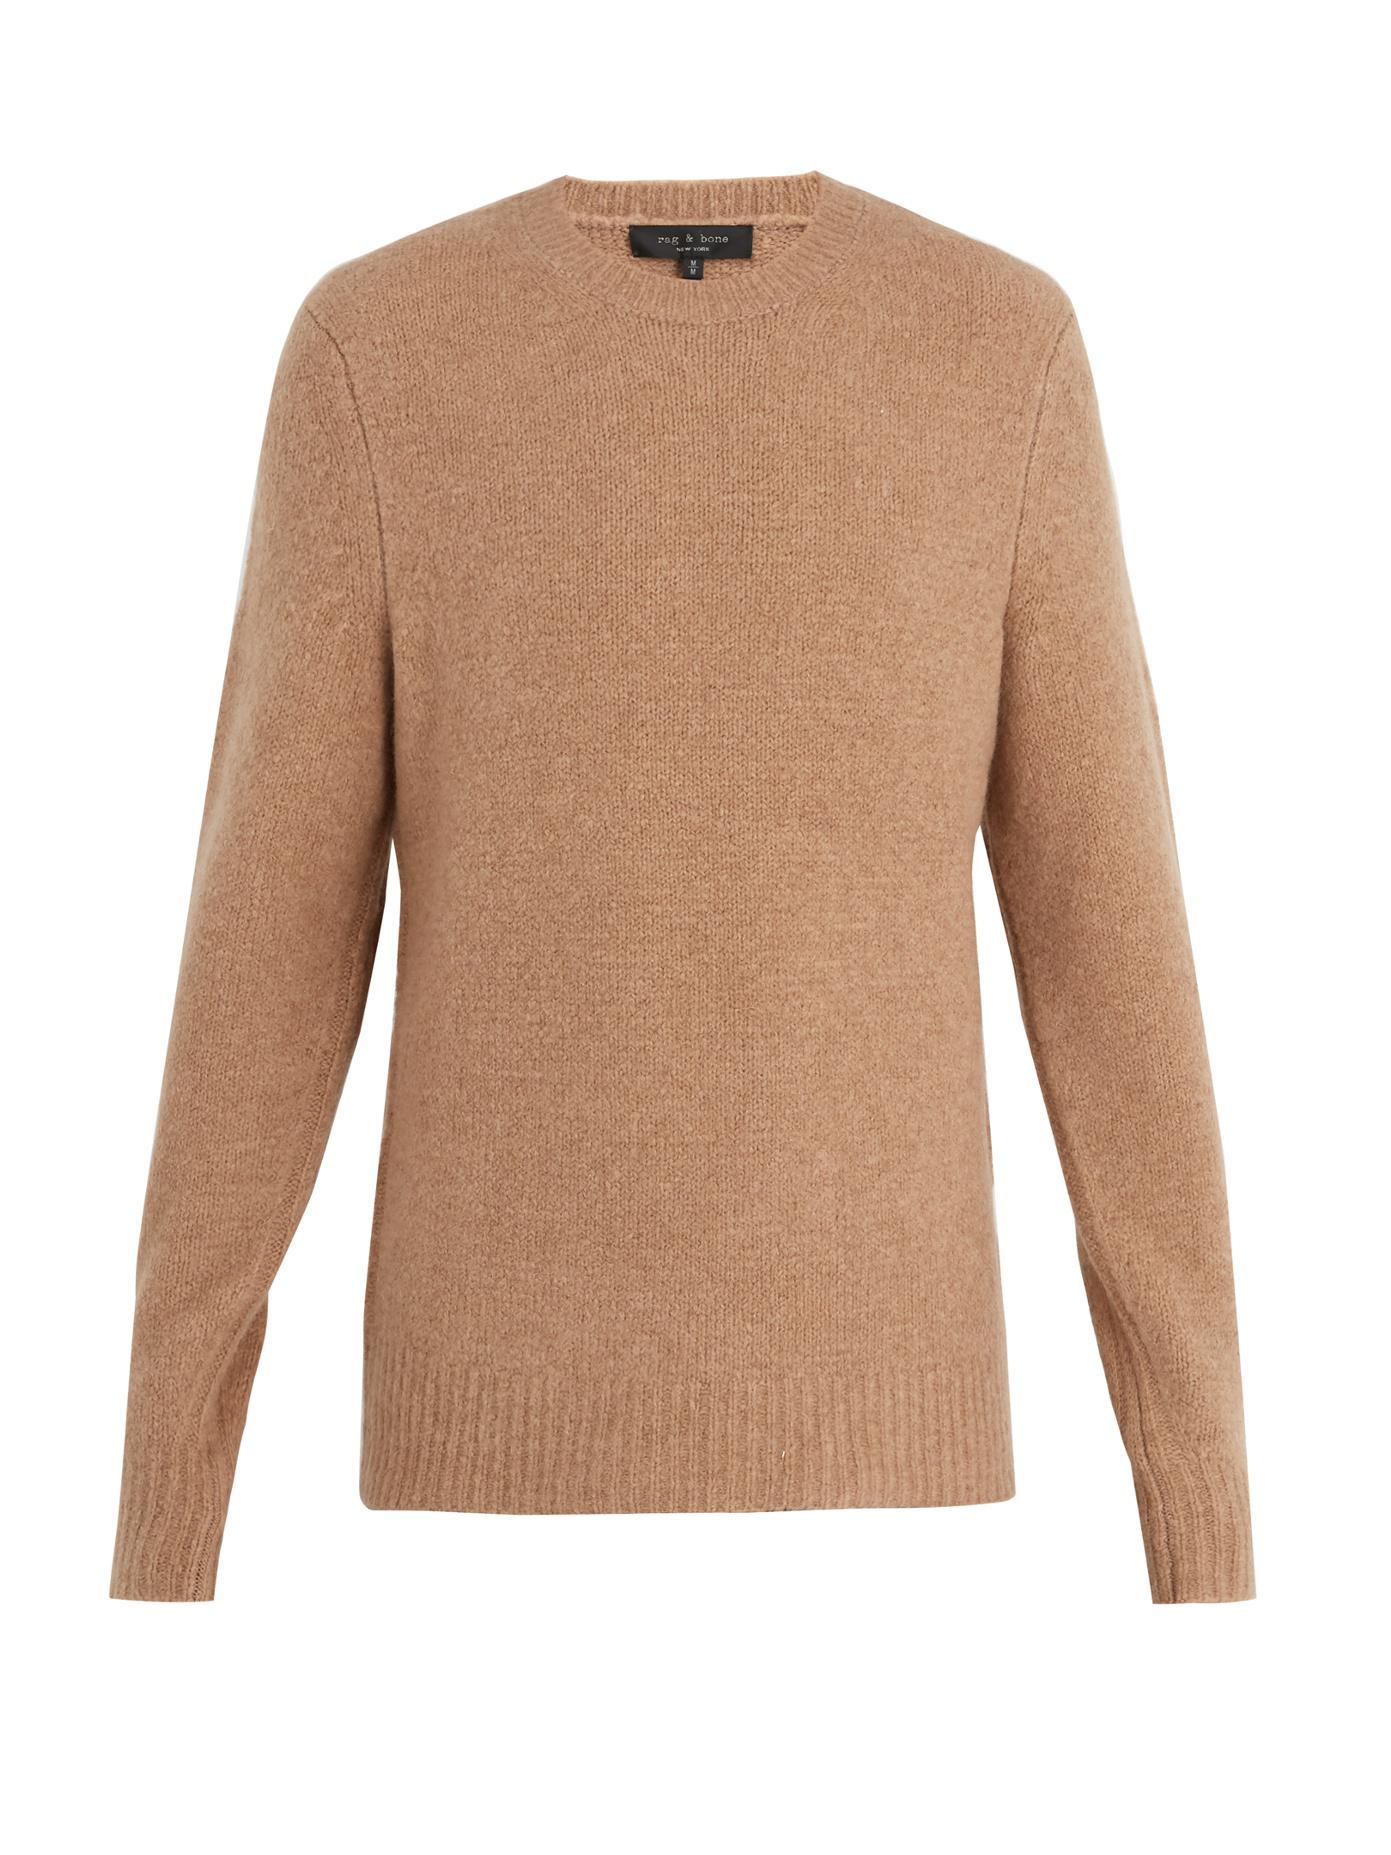 RAG&BONE Charles Merino Wool-blend Sweater - Tan b5XUB4